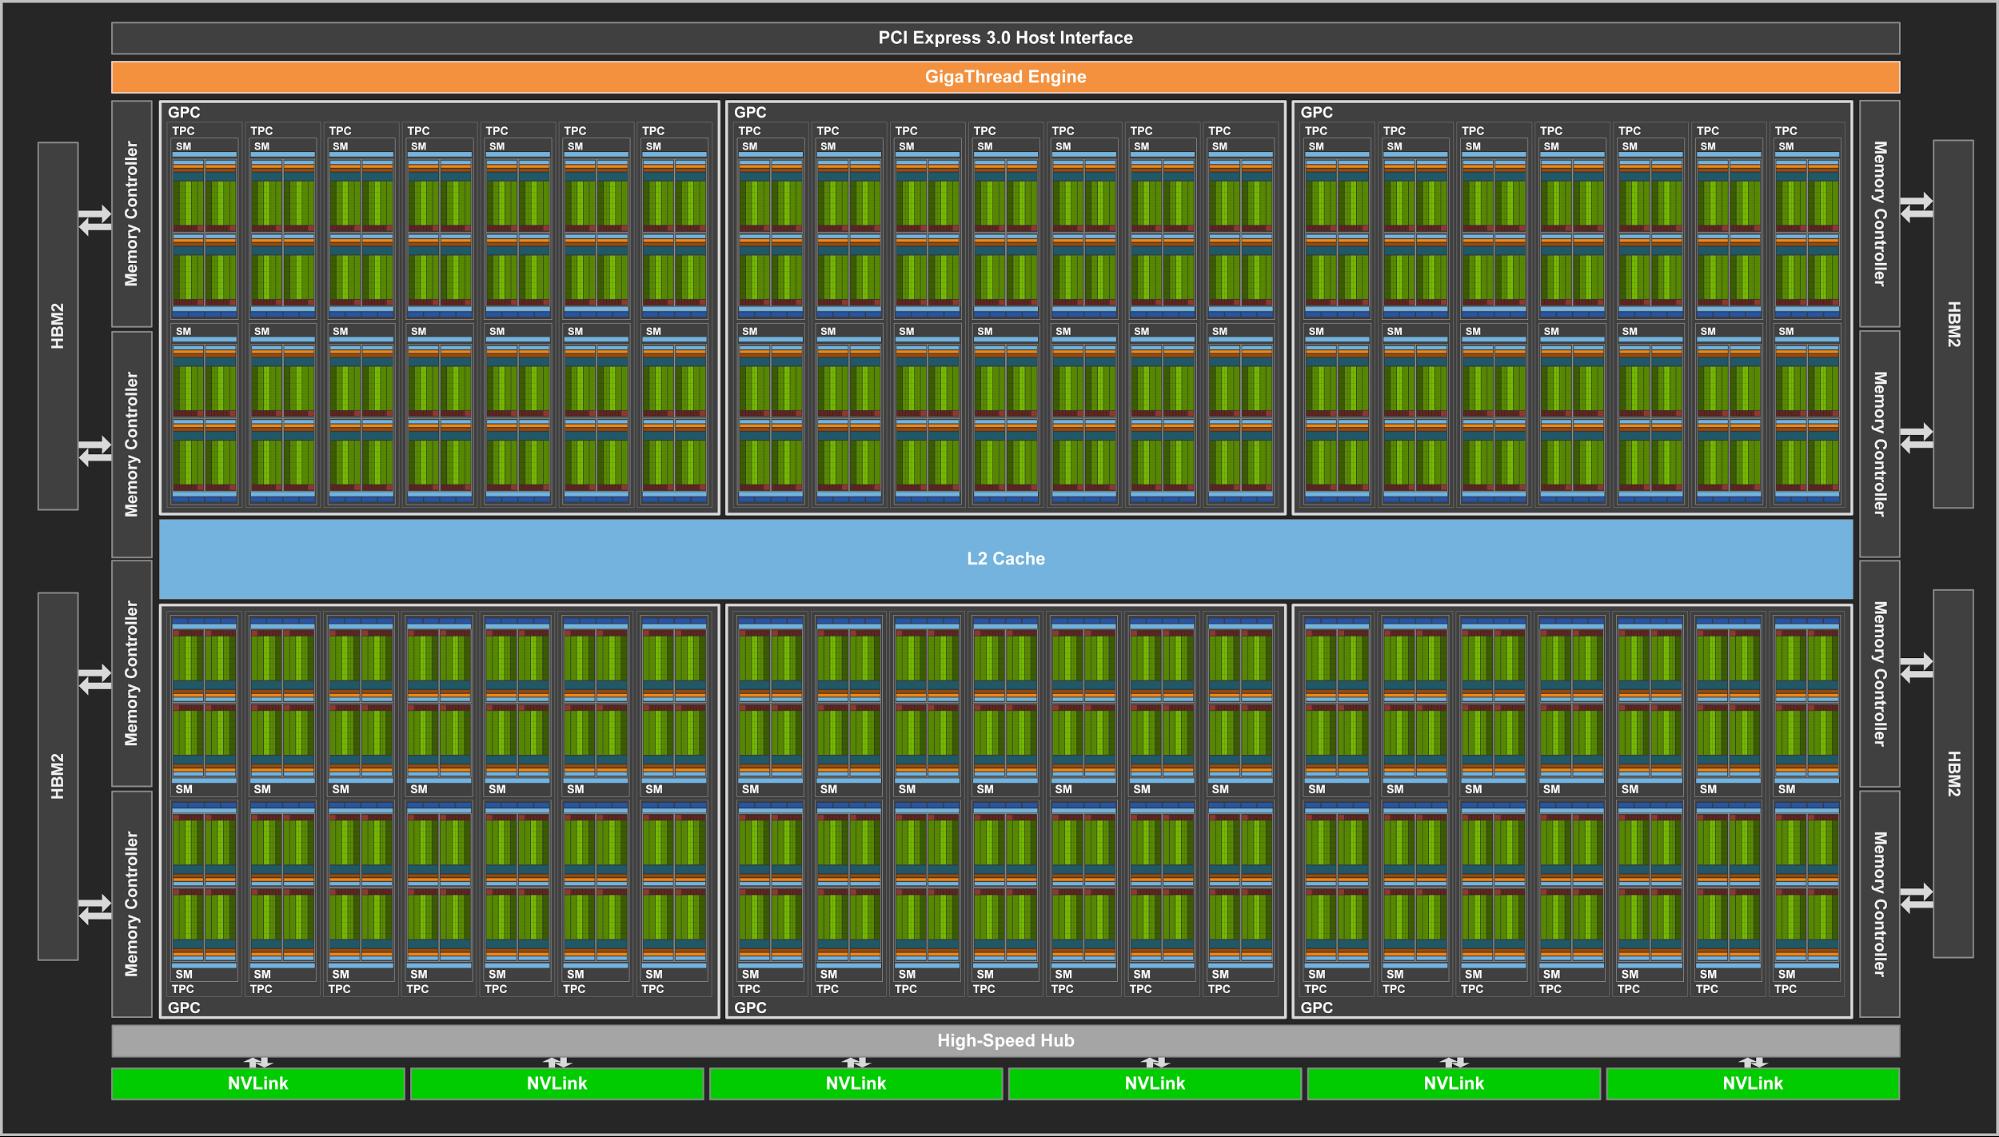 Figure 5: Volta GV100 Full GPU with 84 SM Units.